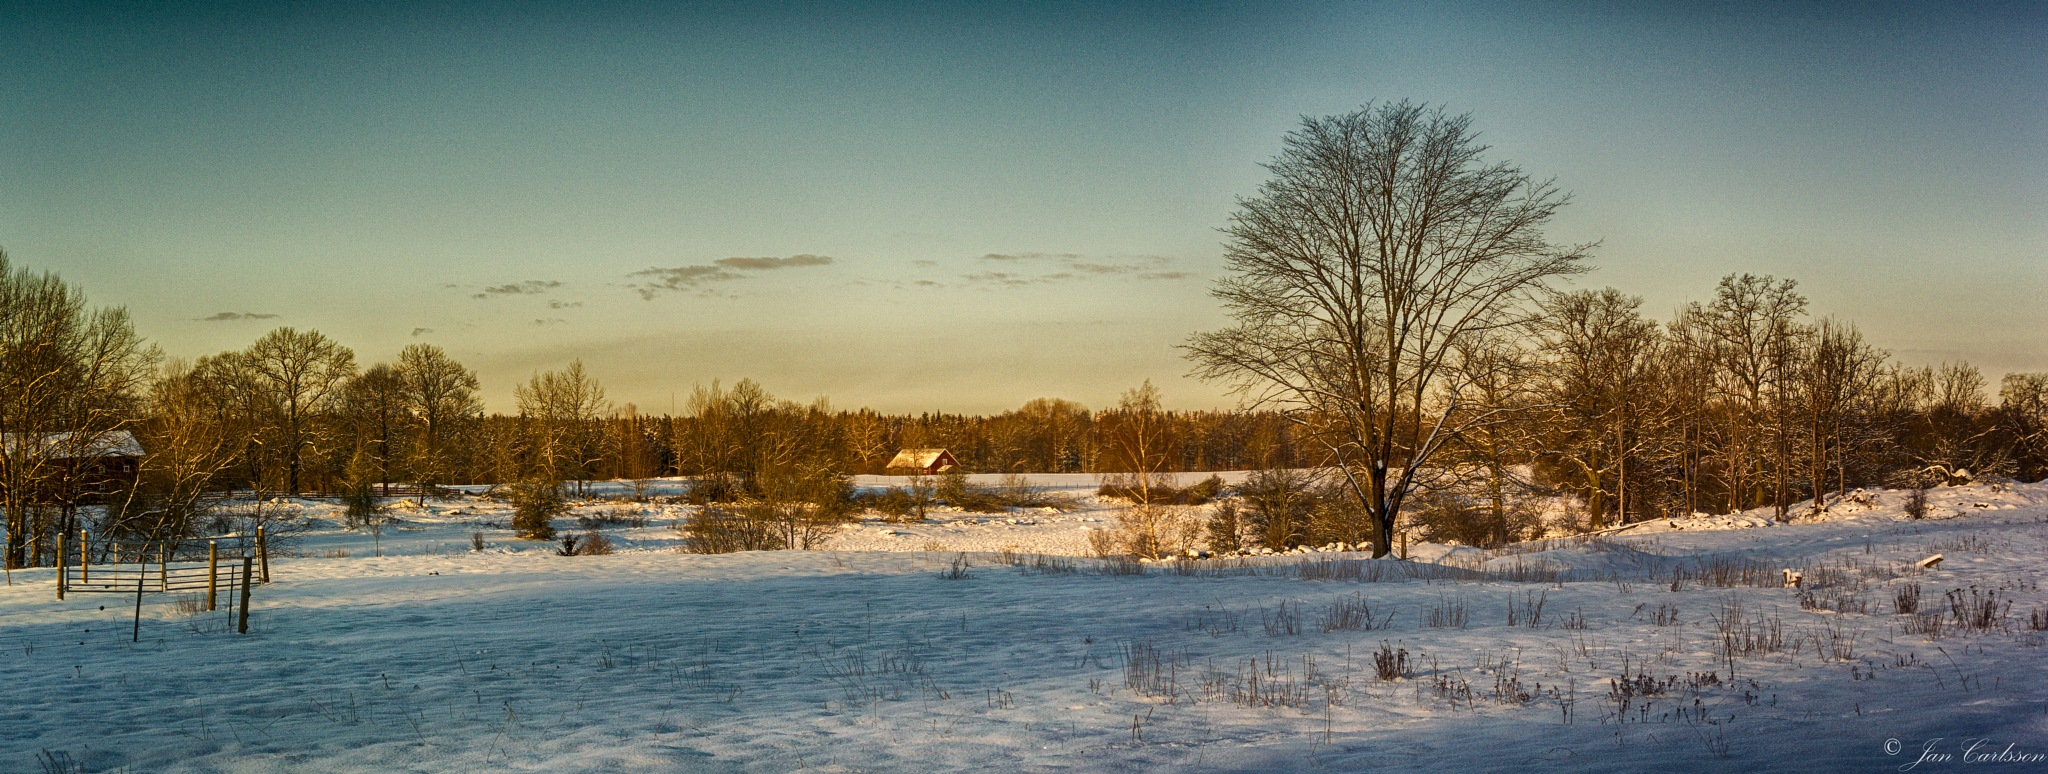 Winterland by carljan w carlsson